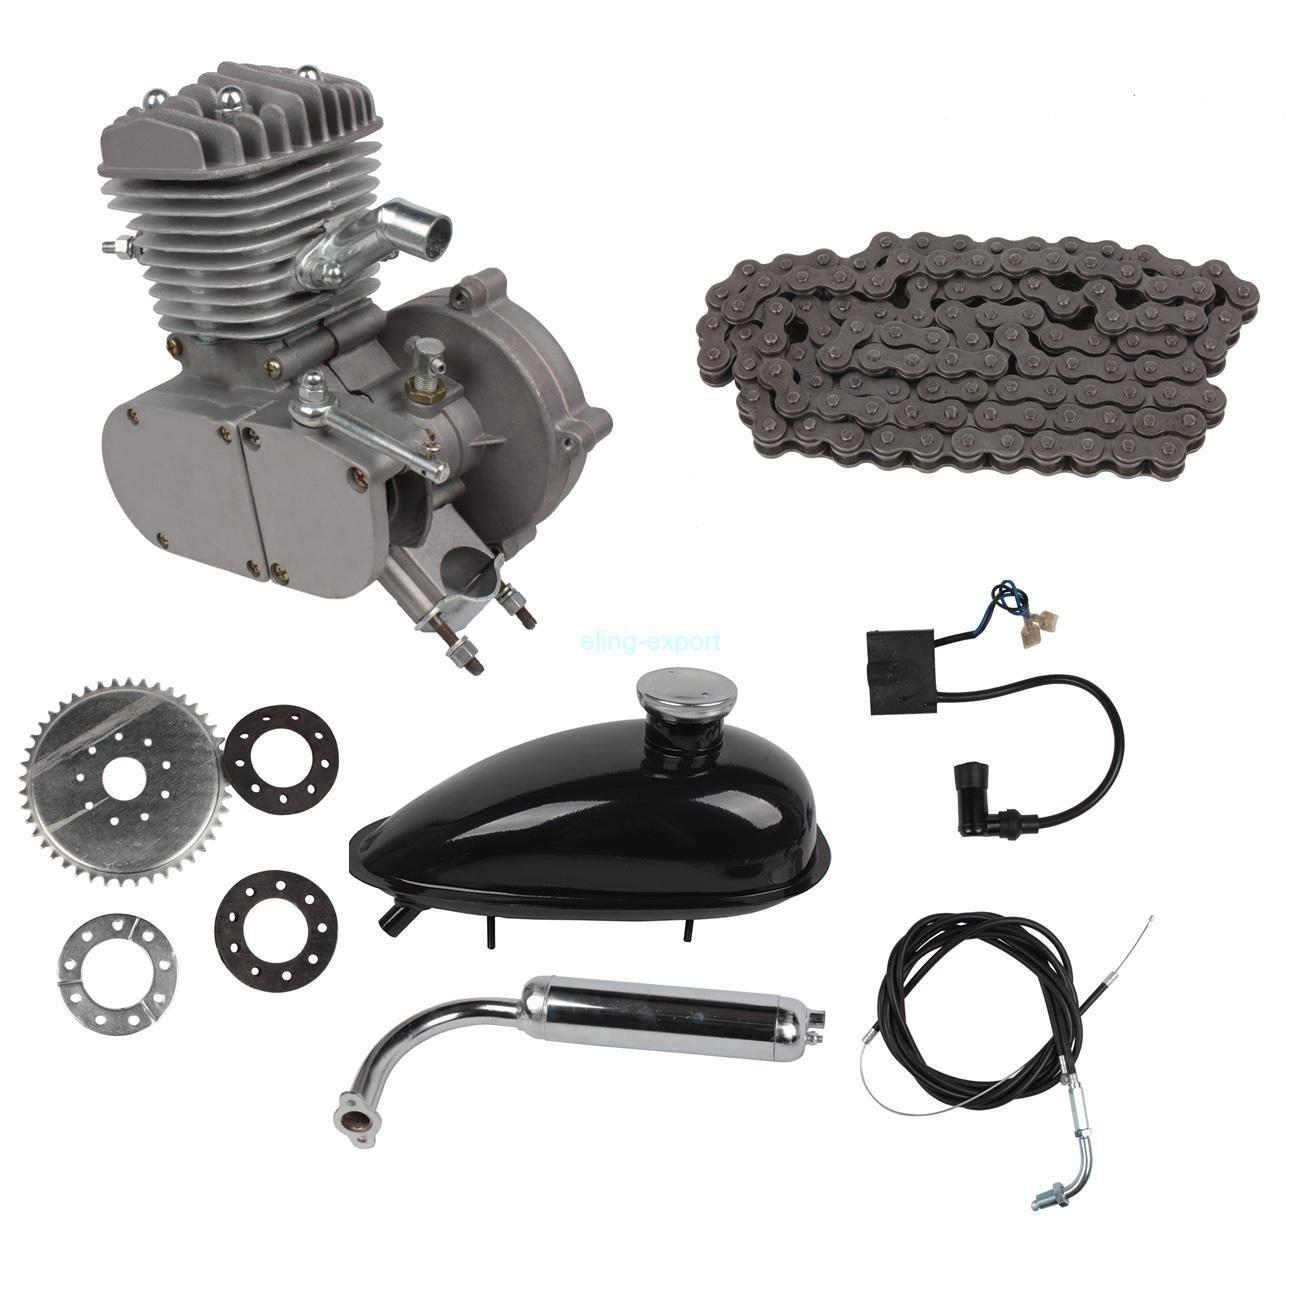 RayWax Motorizado Bicicleta 80CC Kit, 2 Trazo Kit de Motor de ...